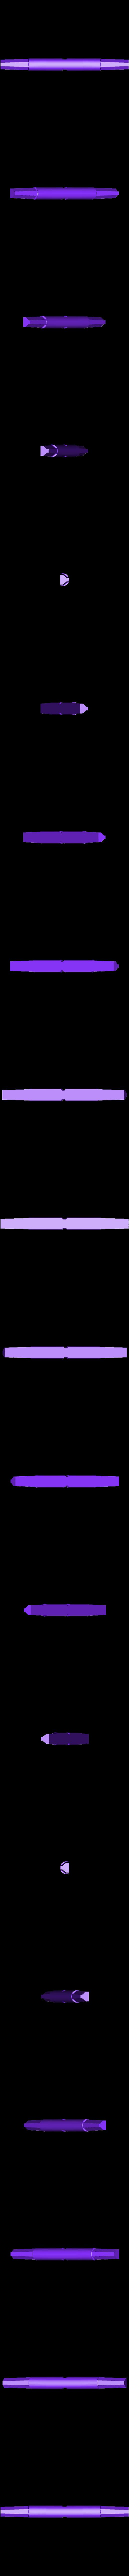 Hanging_Bar.stl Download free STL file The Next Towel • 3D printer template, AcE-Craft